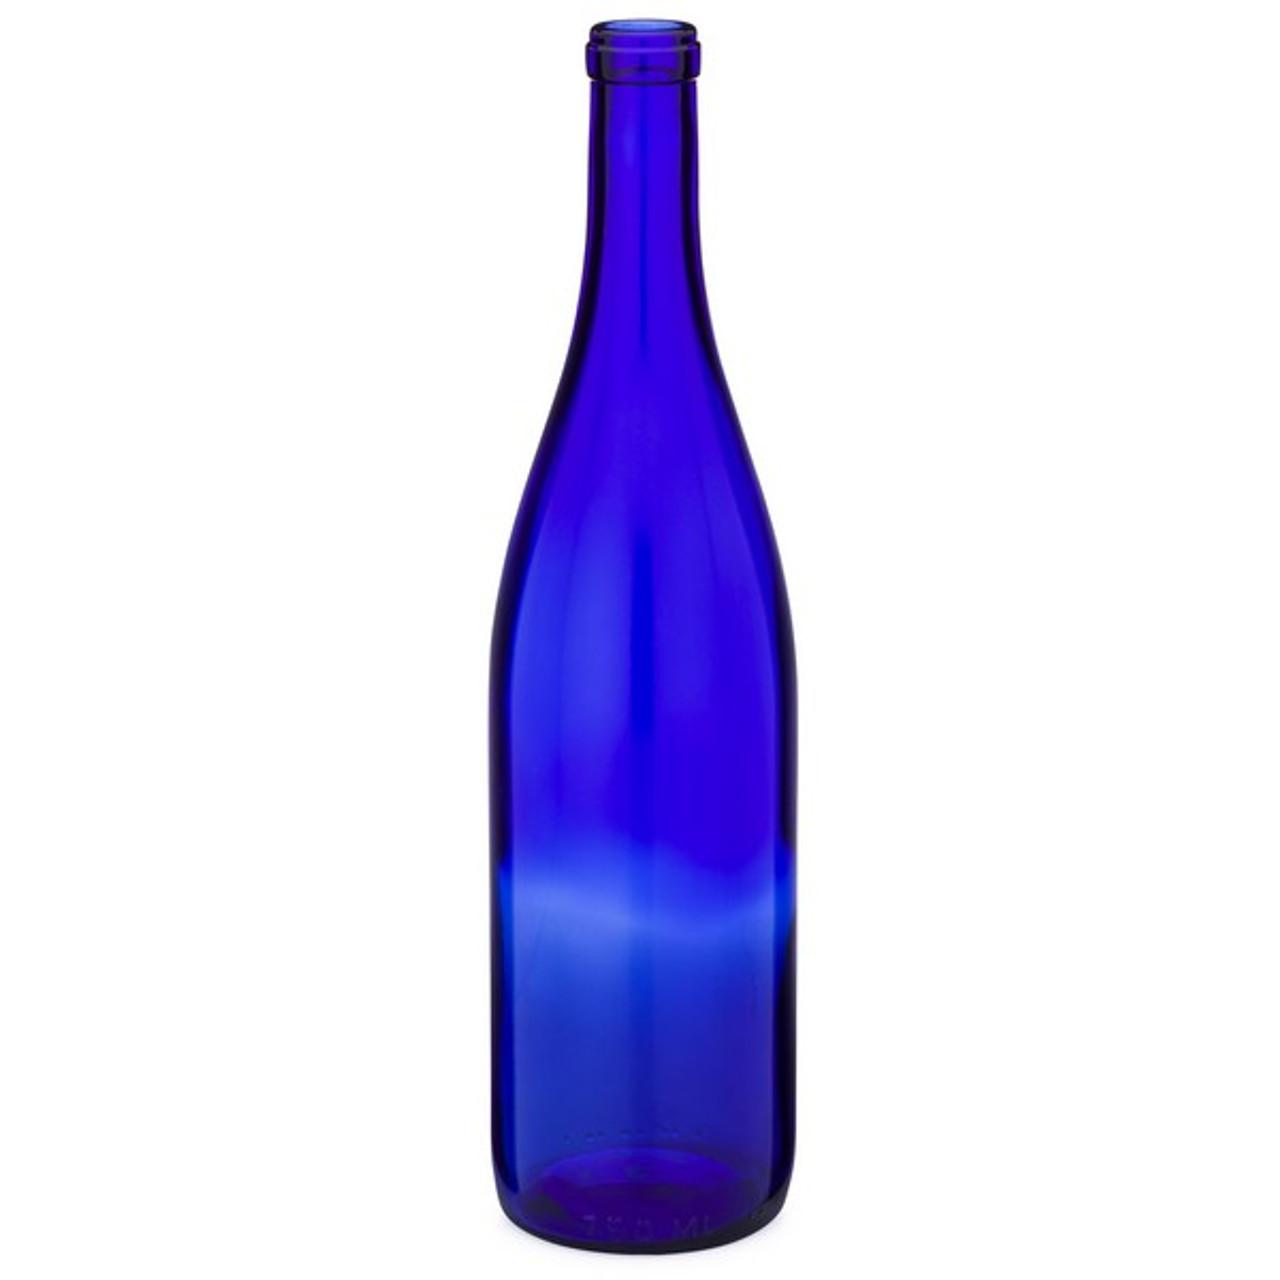 f676e467f5e7 750 ml Blue Glass Hock Wine Bottles, Cork Finish - 6005B01BLU